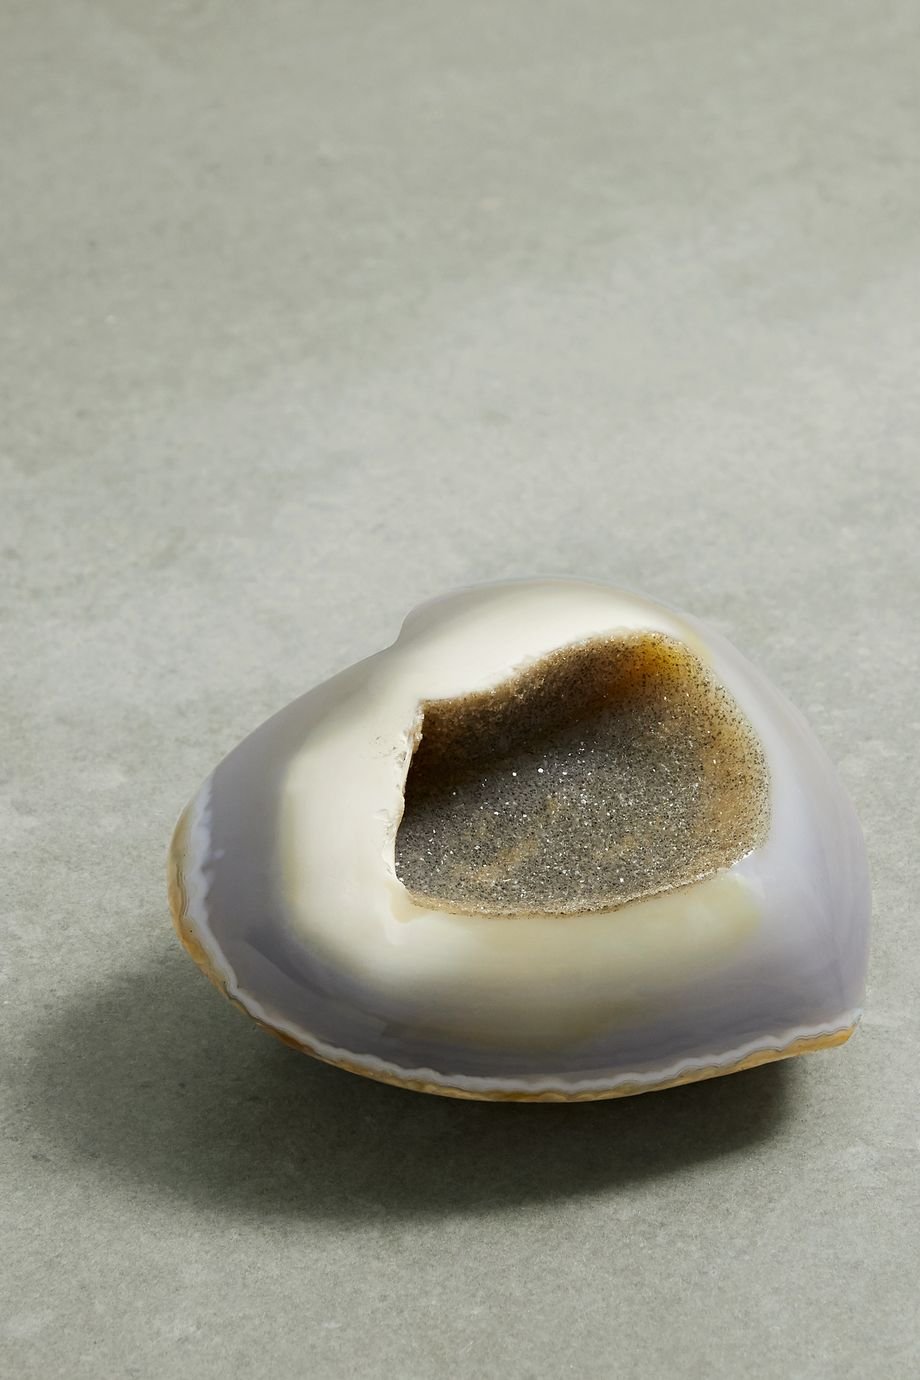 Kimberly McDonald Heart 矿物晶洞